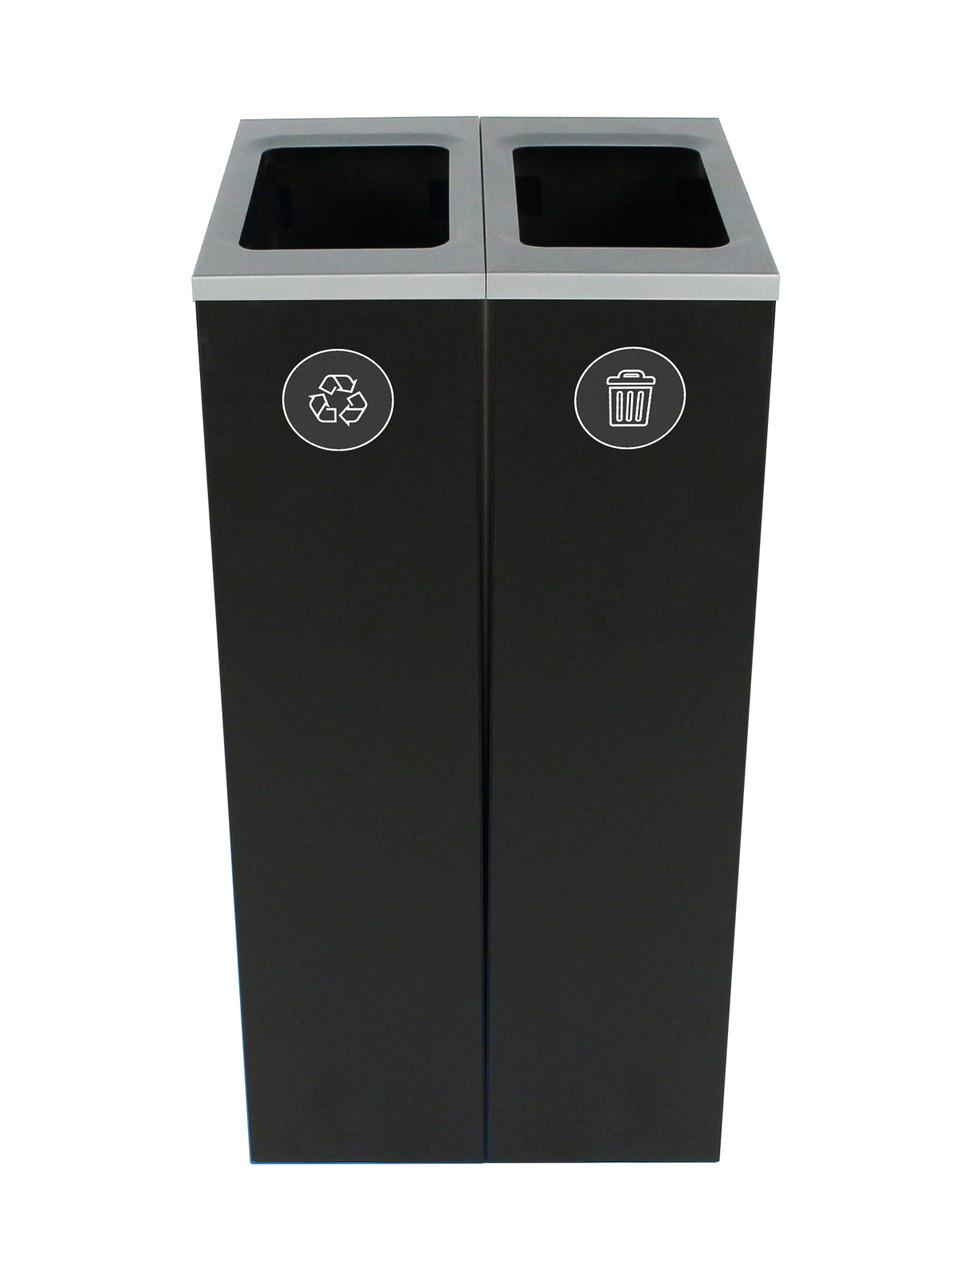 20 Gallon Spectrum Slim Dual Trash Can & Recycle Bin Black 8107100-44